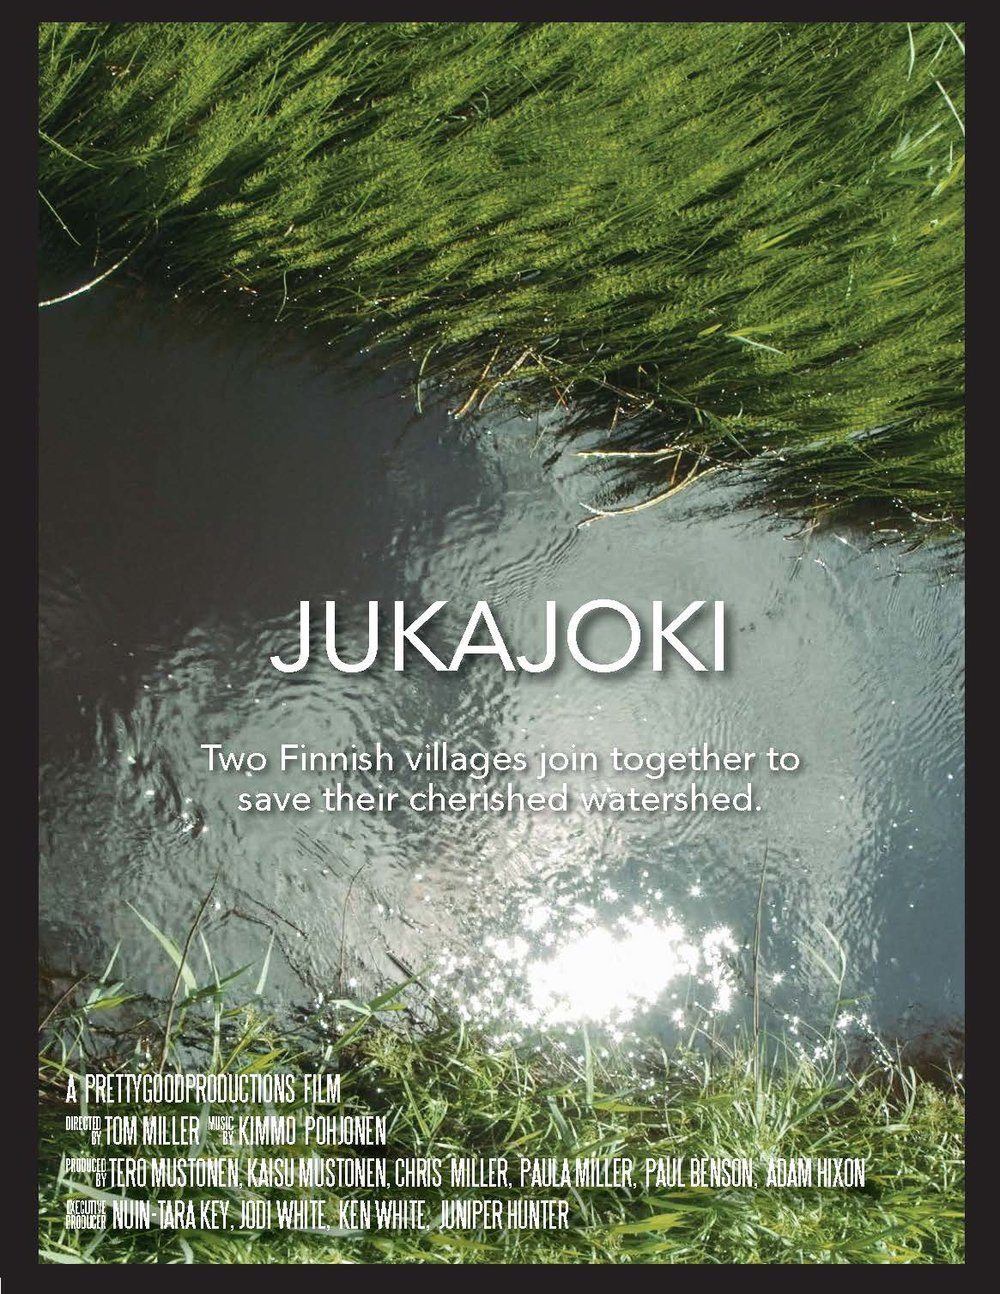 jukajoki-poster.jpg